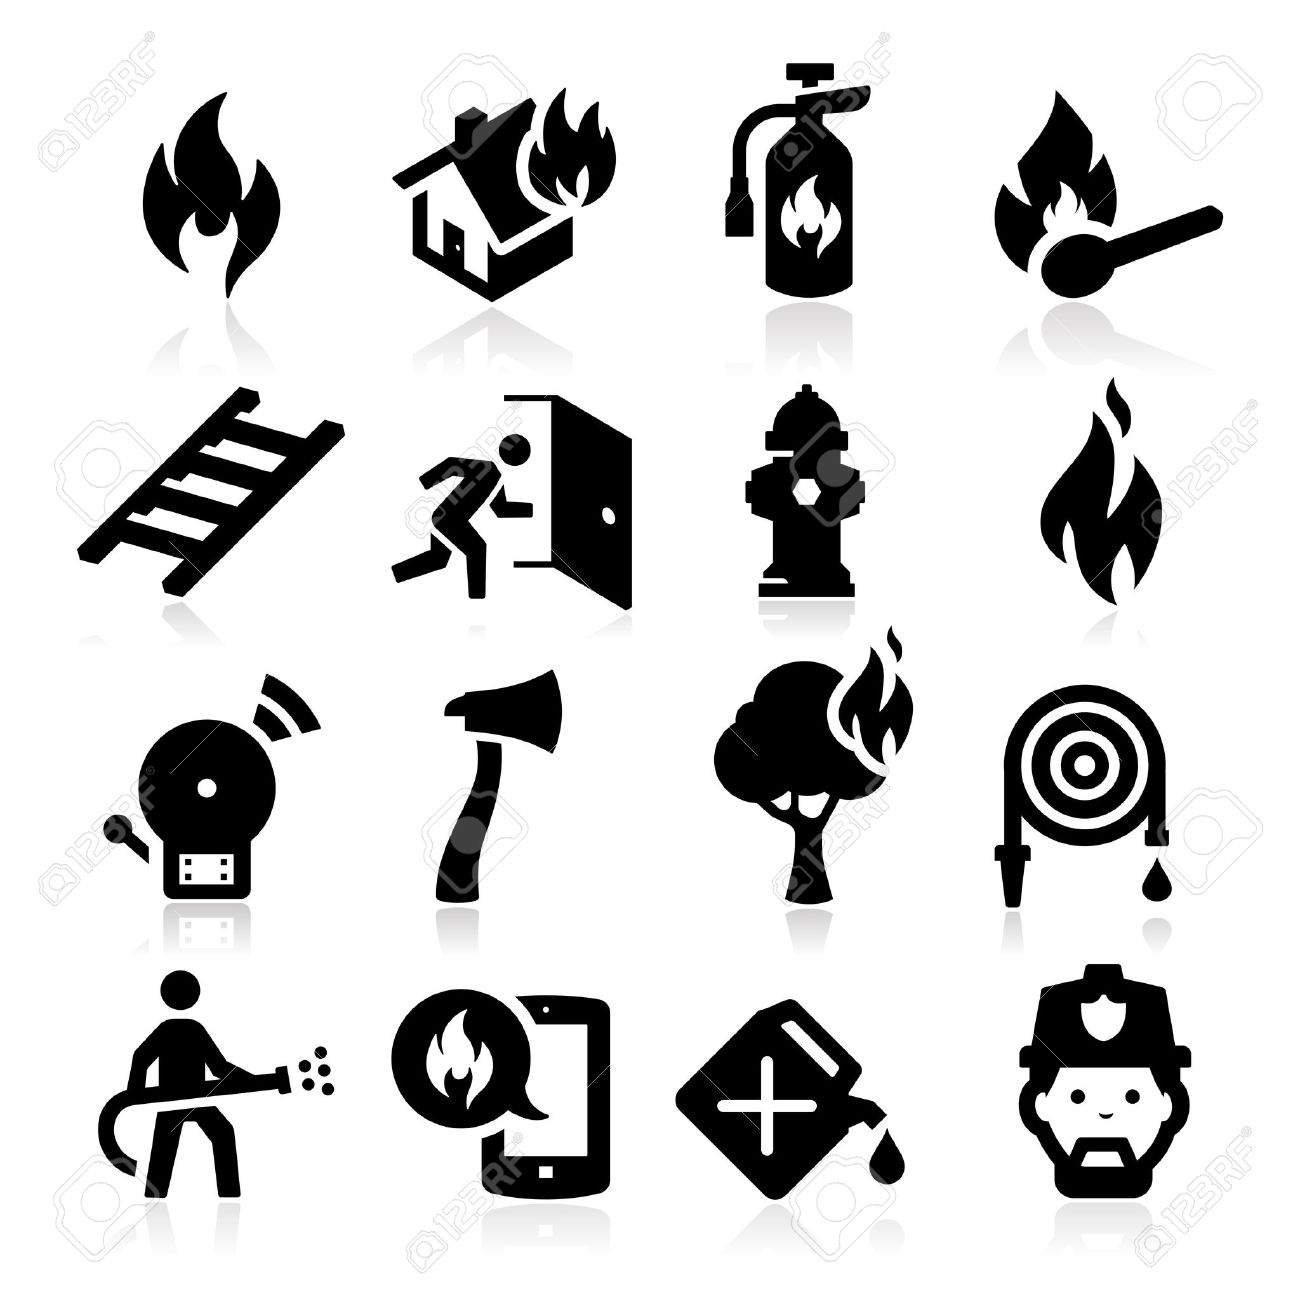 Firefighting icons - 23863792